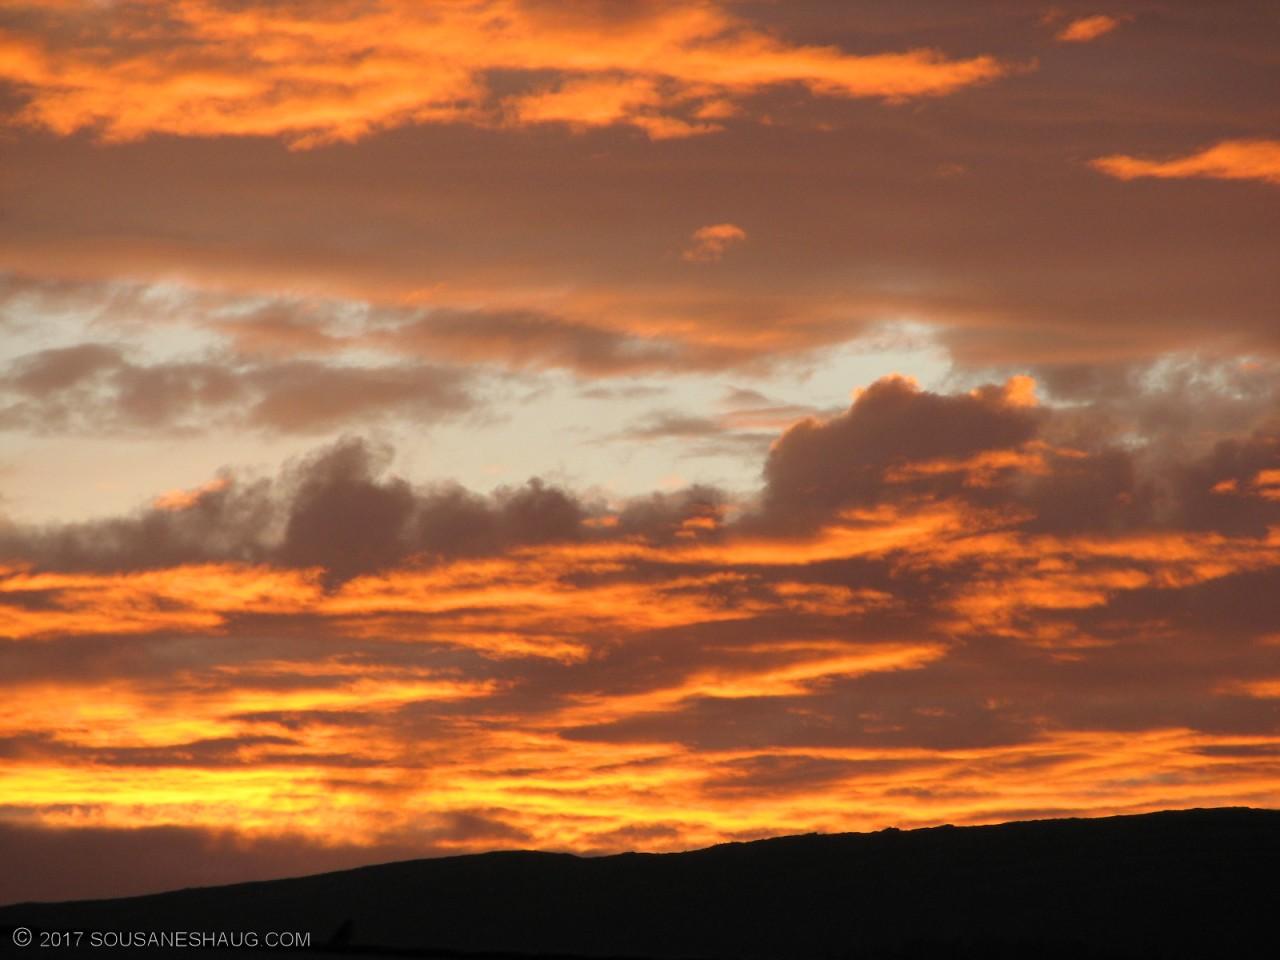 Sunset-sky-on-fire-4